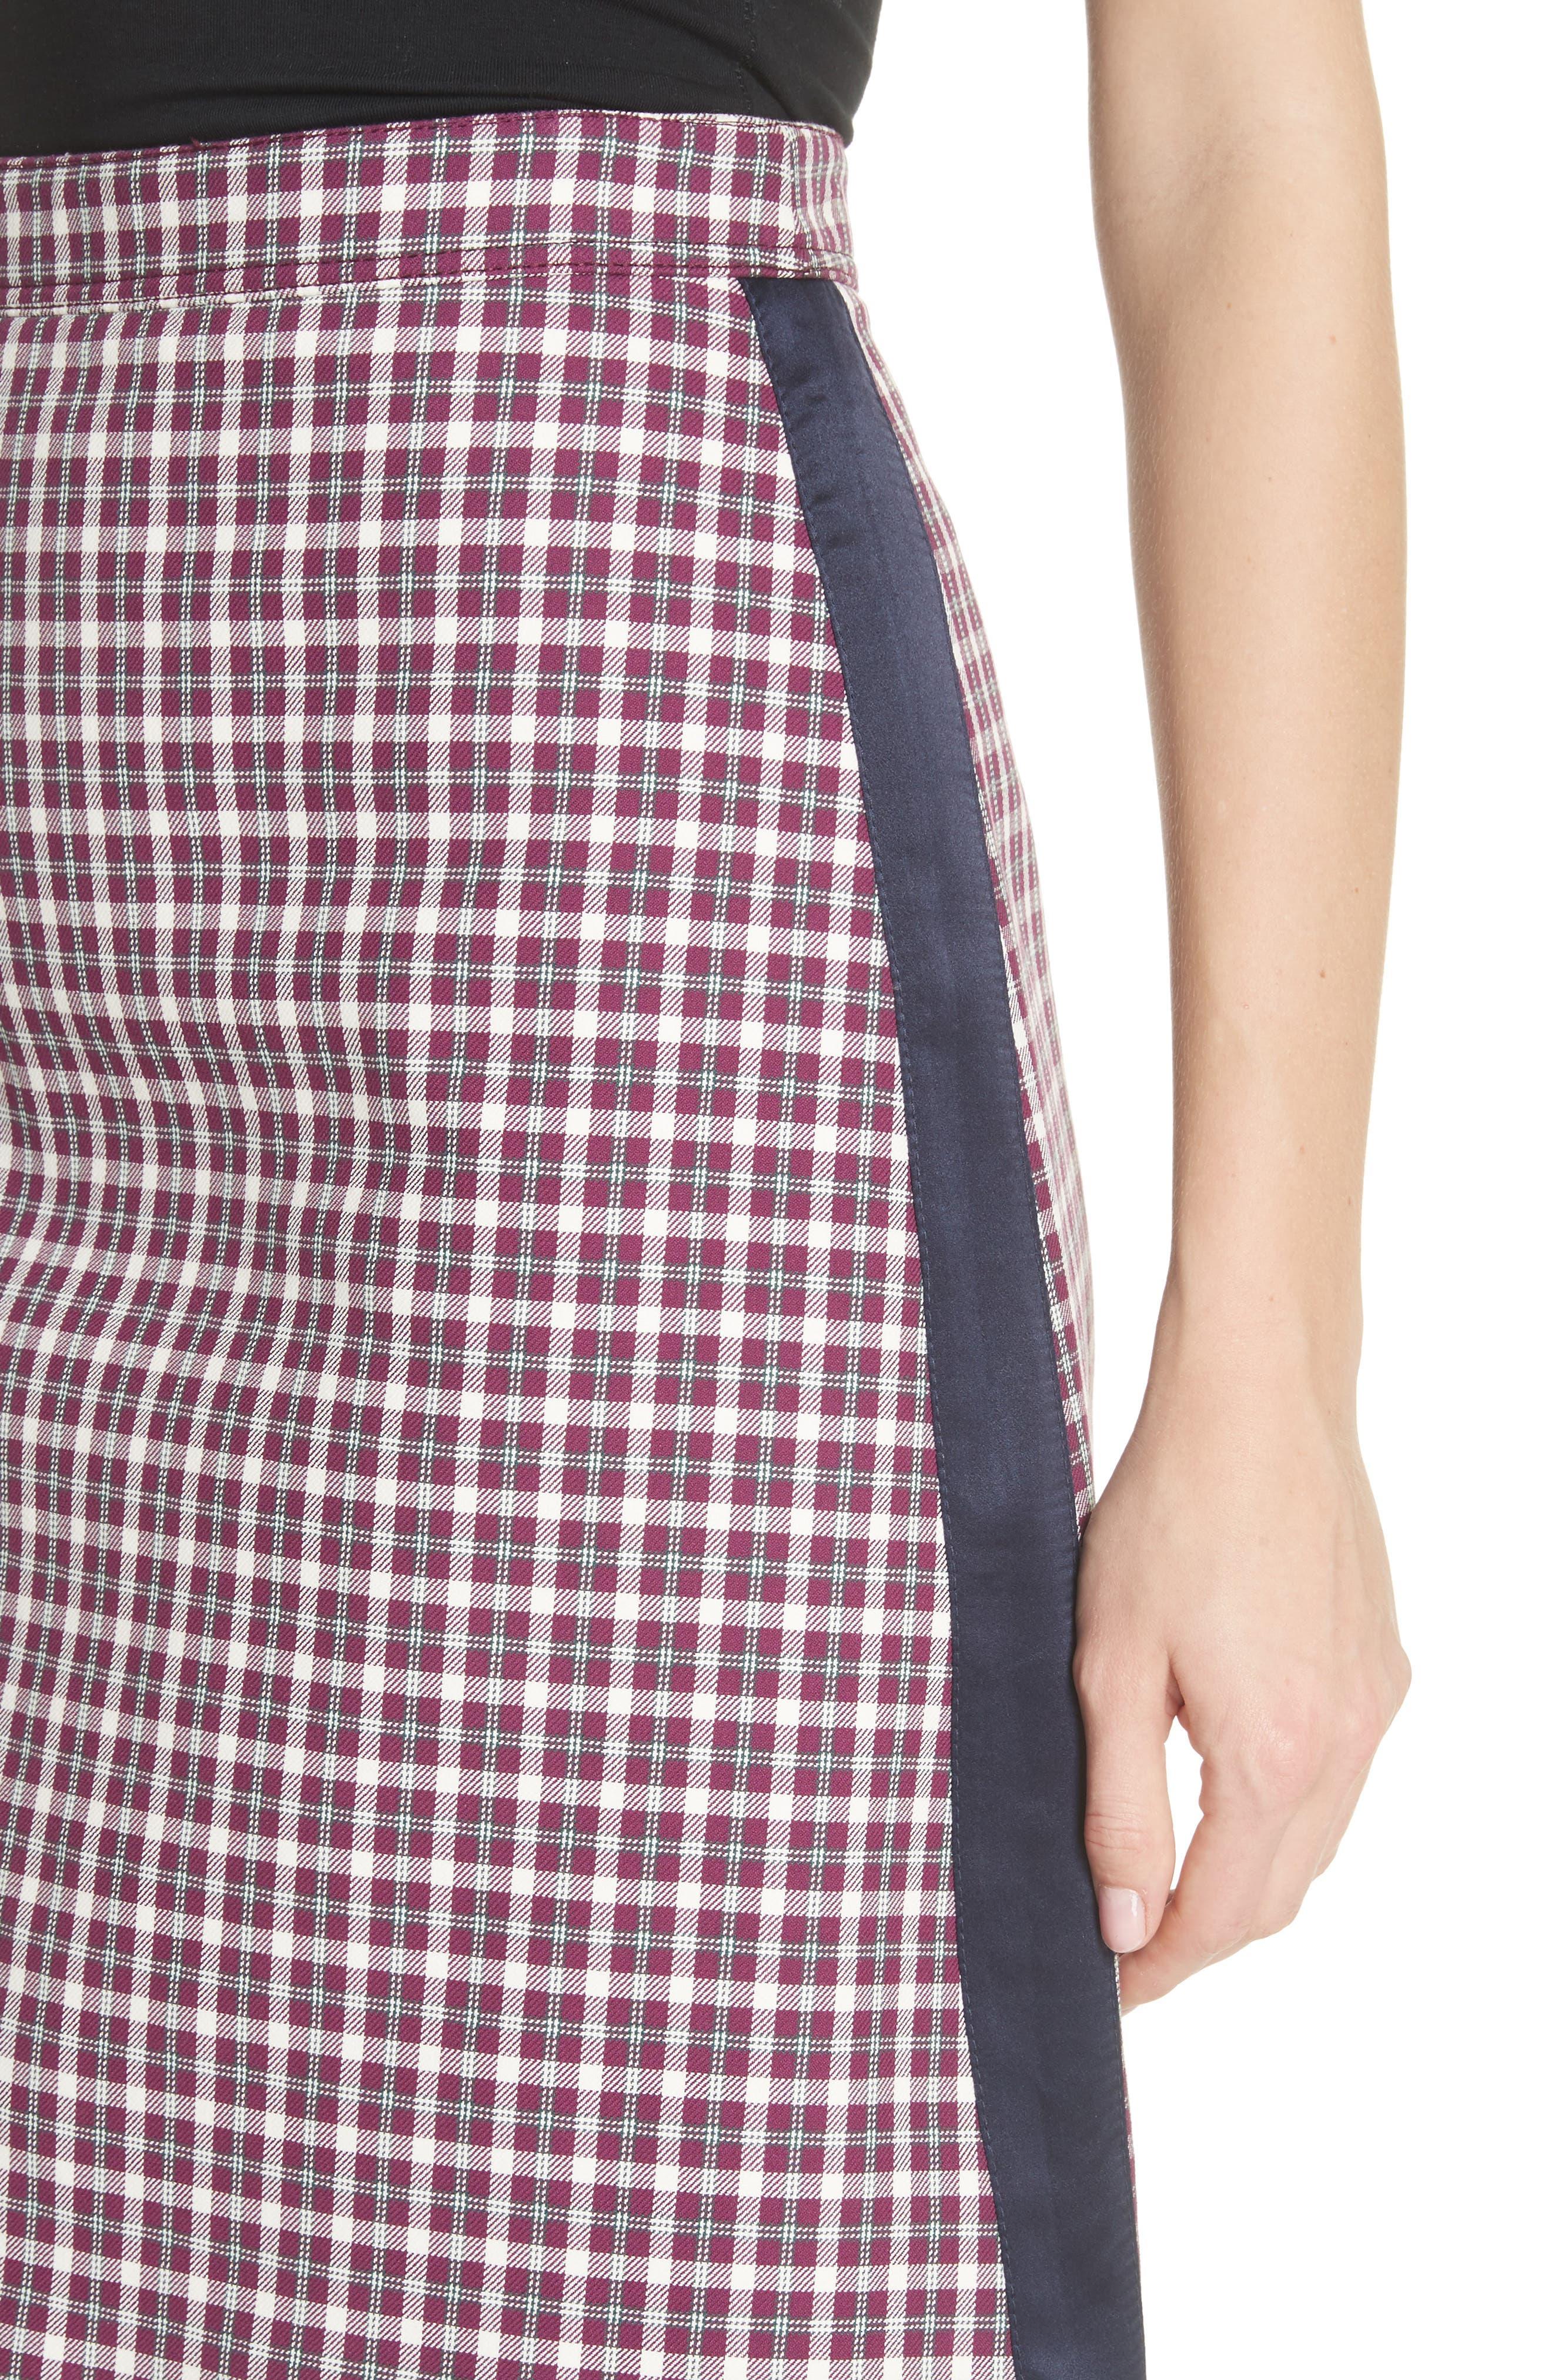 Stanforth Plaid A-Line Skirt,                             Alternate thumbnail 4, color,                             BURGUNDY